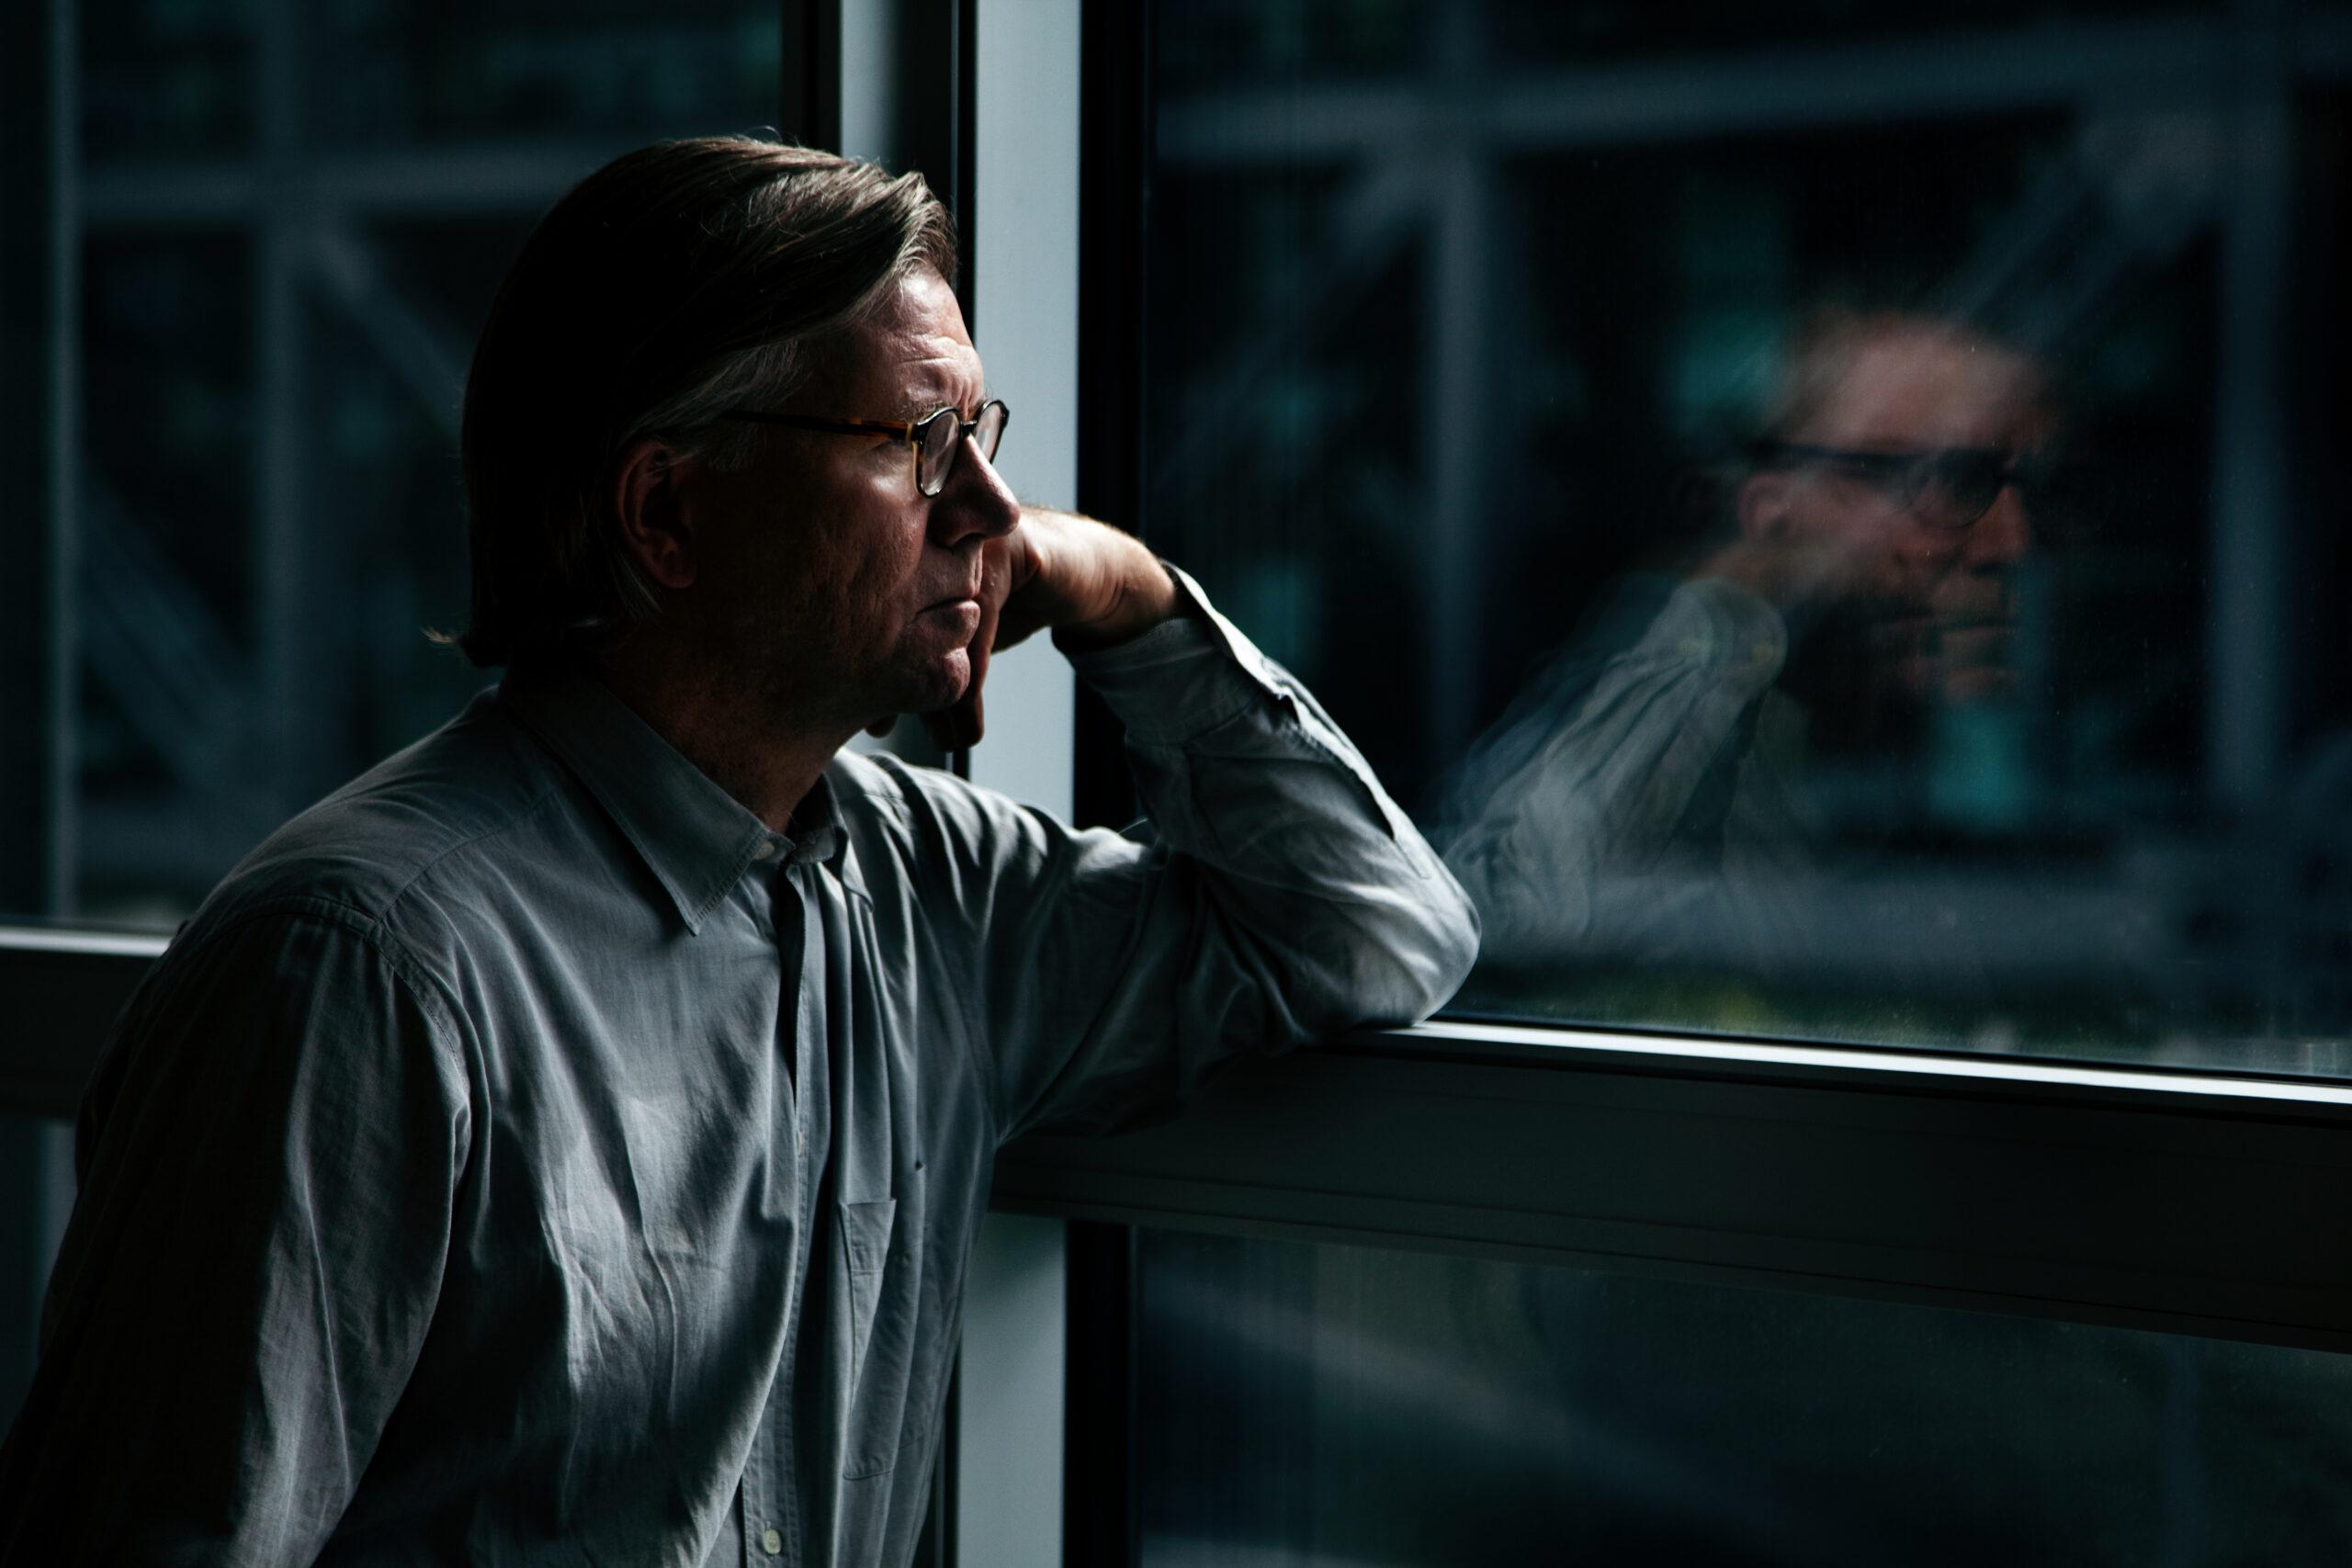 Mental Health: Finding Hope & Help Amid COVID-19